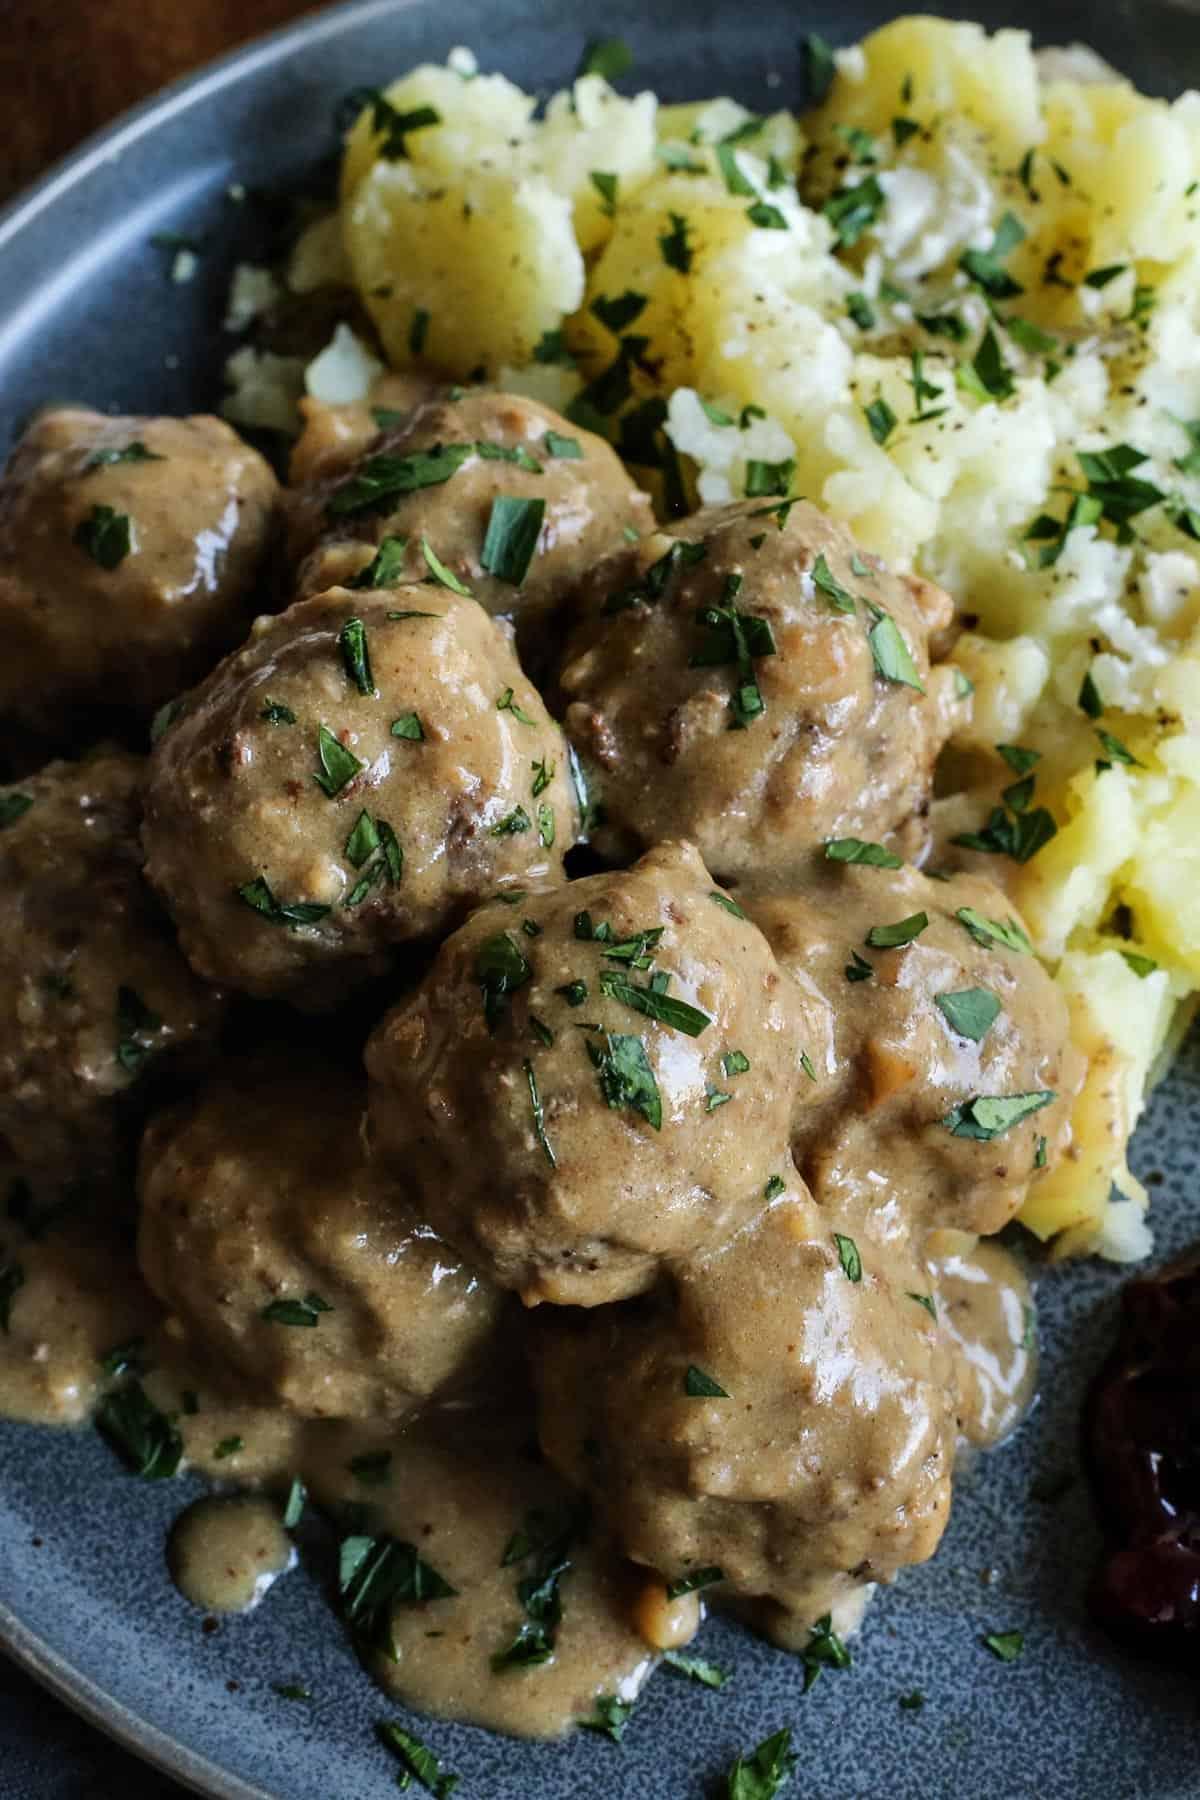 Swedish meatballs with gravy and potatoes